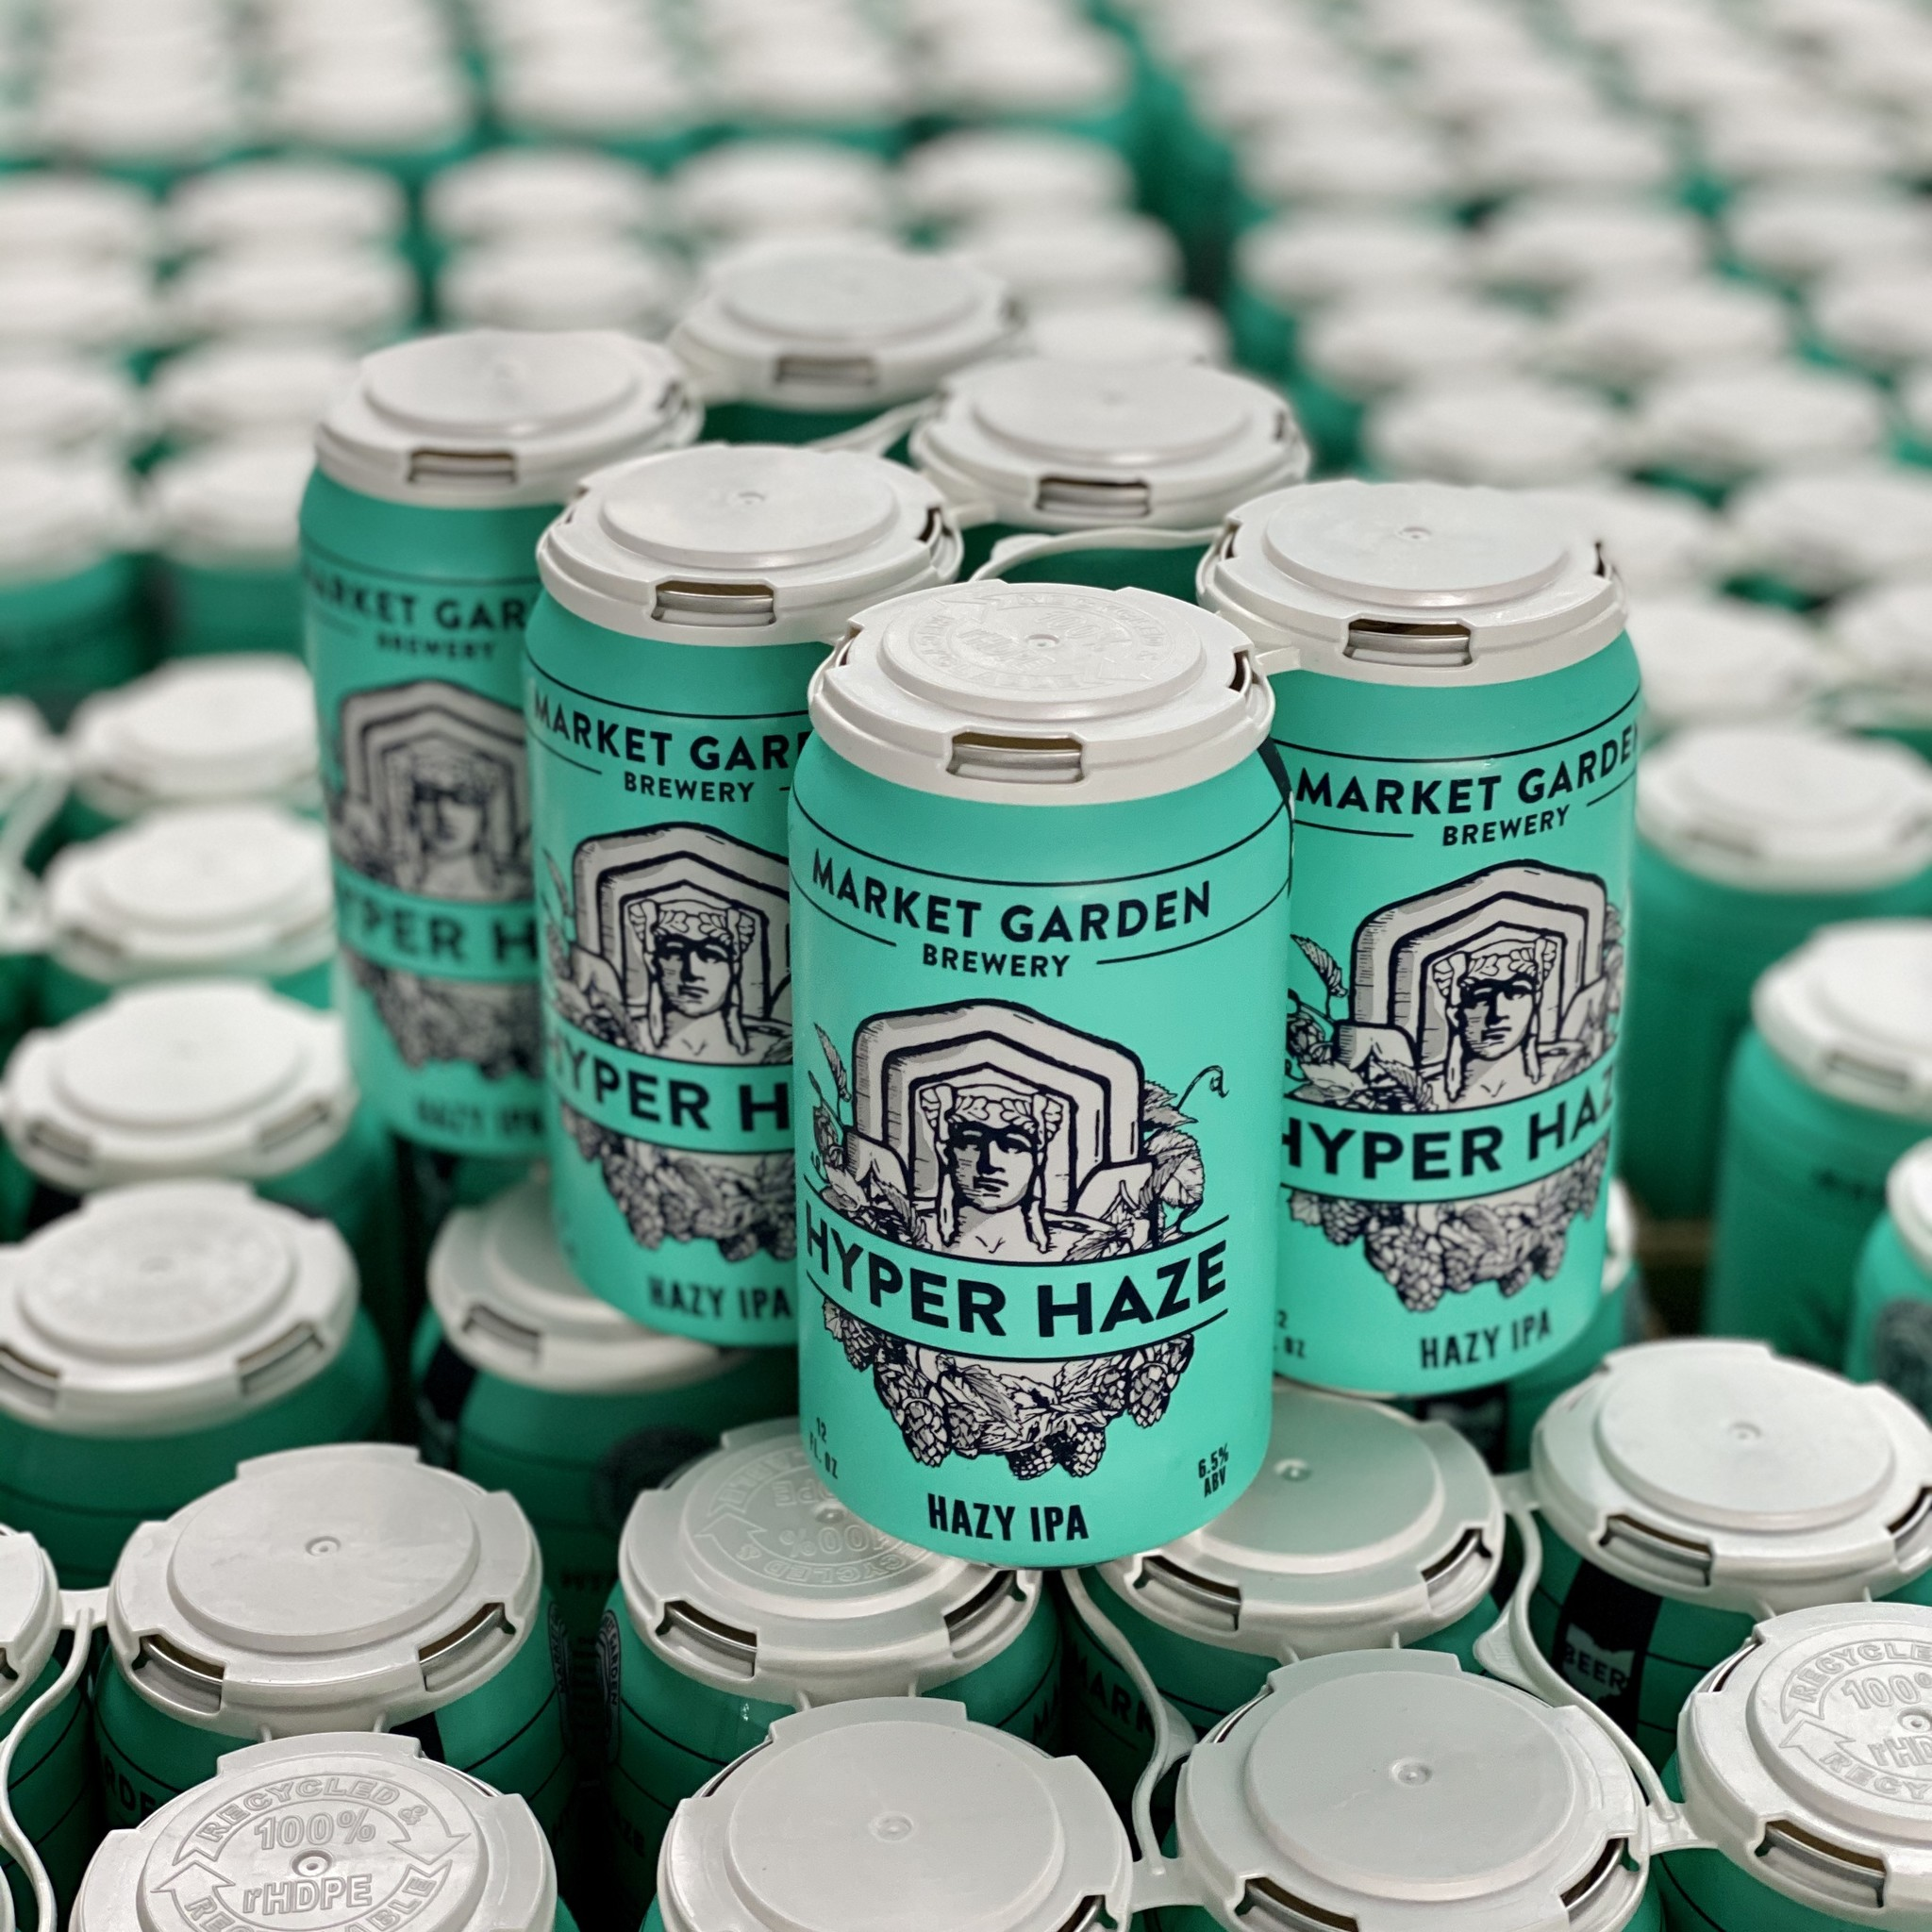 Hyper Haze Hazy IPA 6-pack (cans)